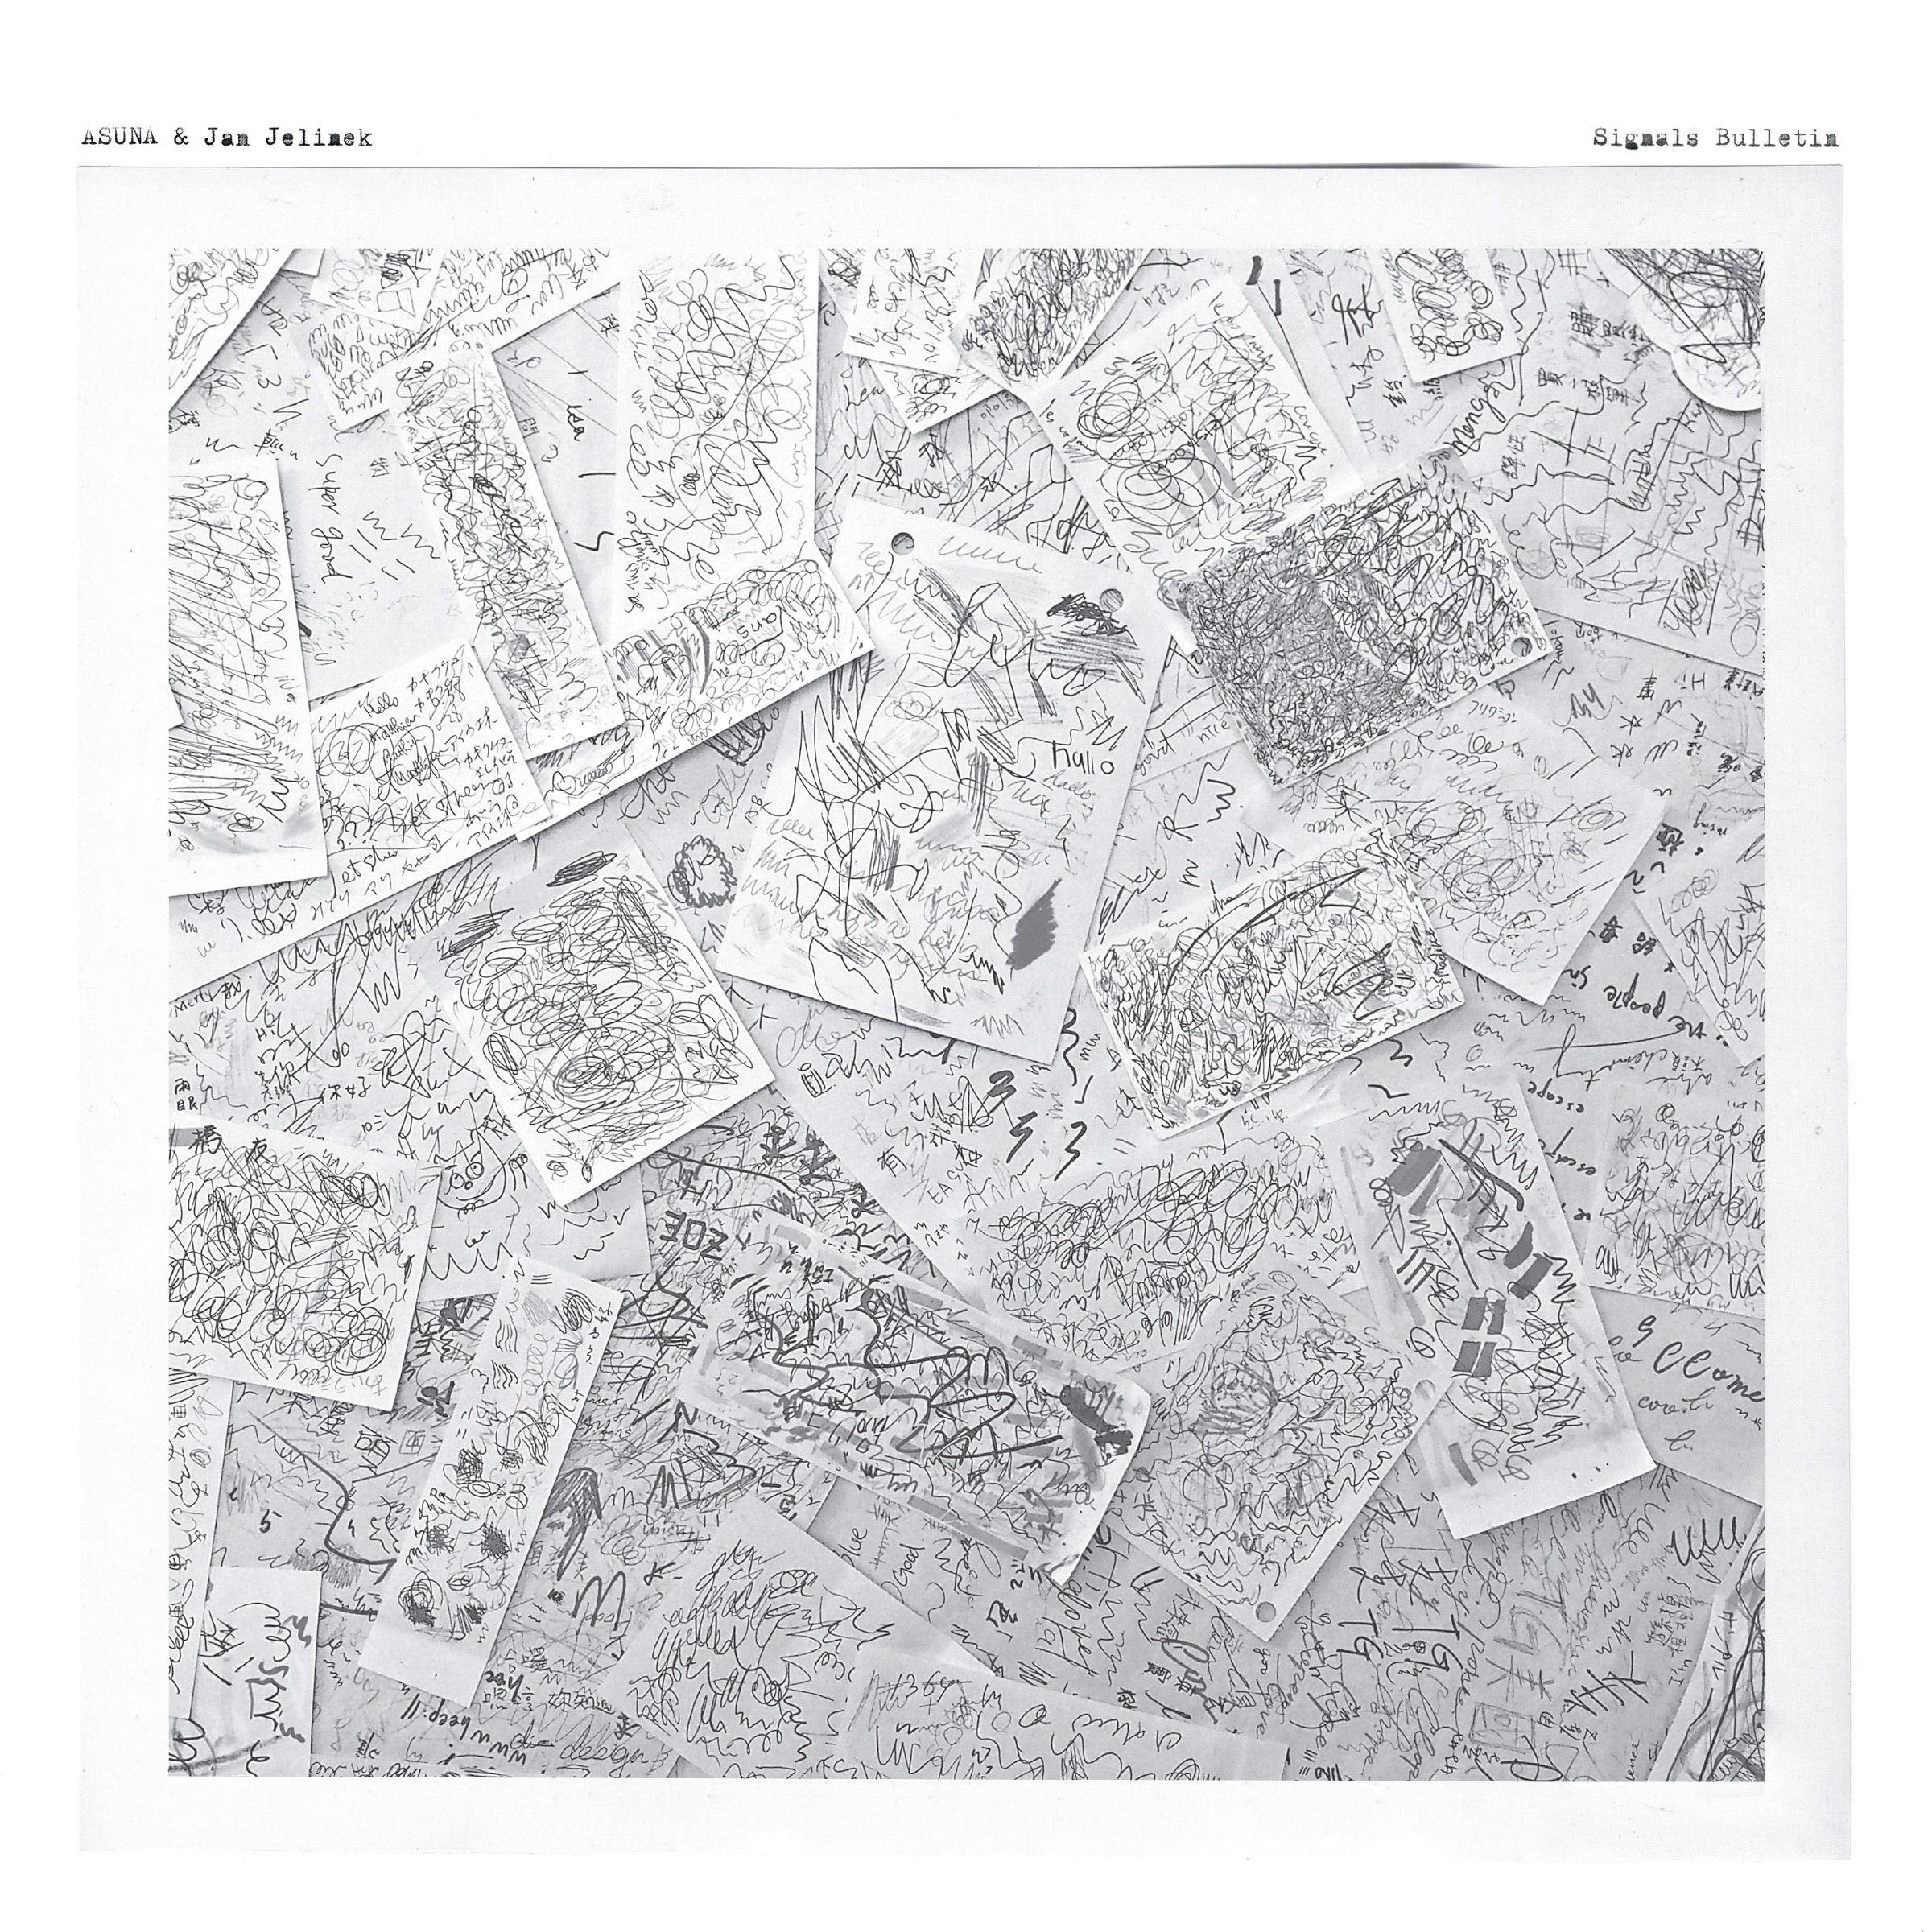 Jan Jelinek collaborates with Japanese sound artist ASUNA on Signals Bulletin